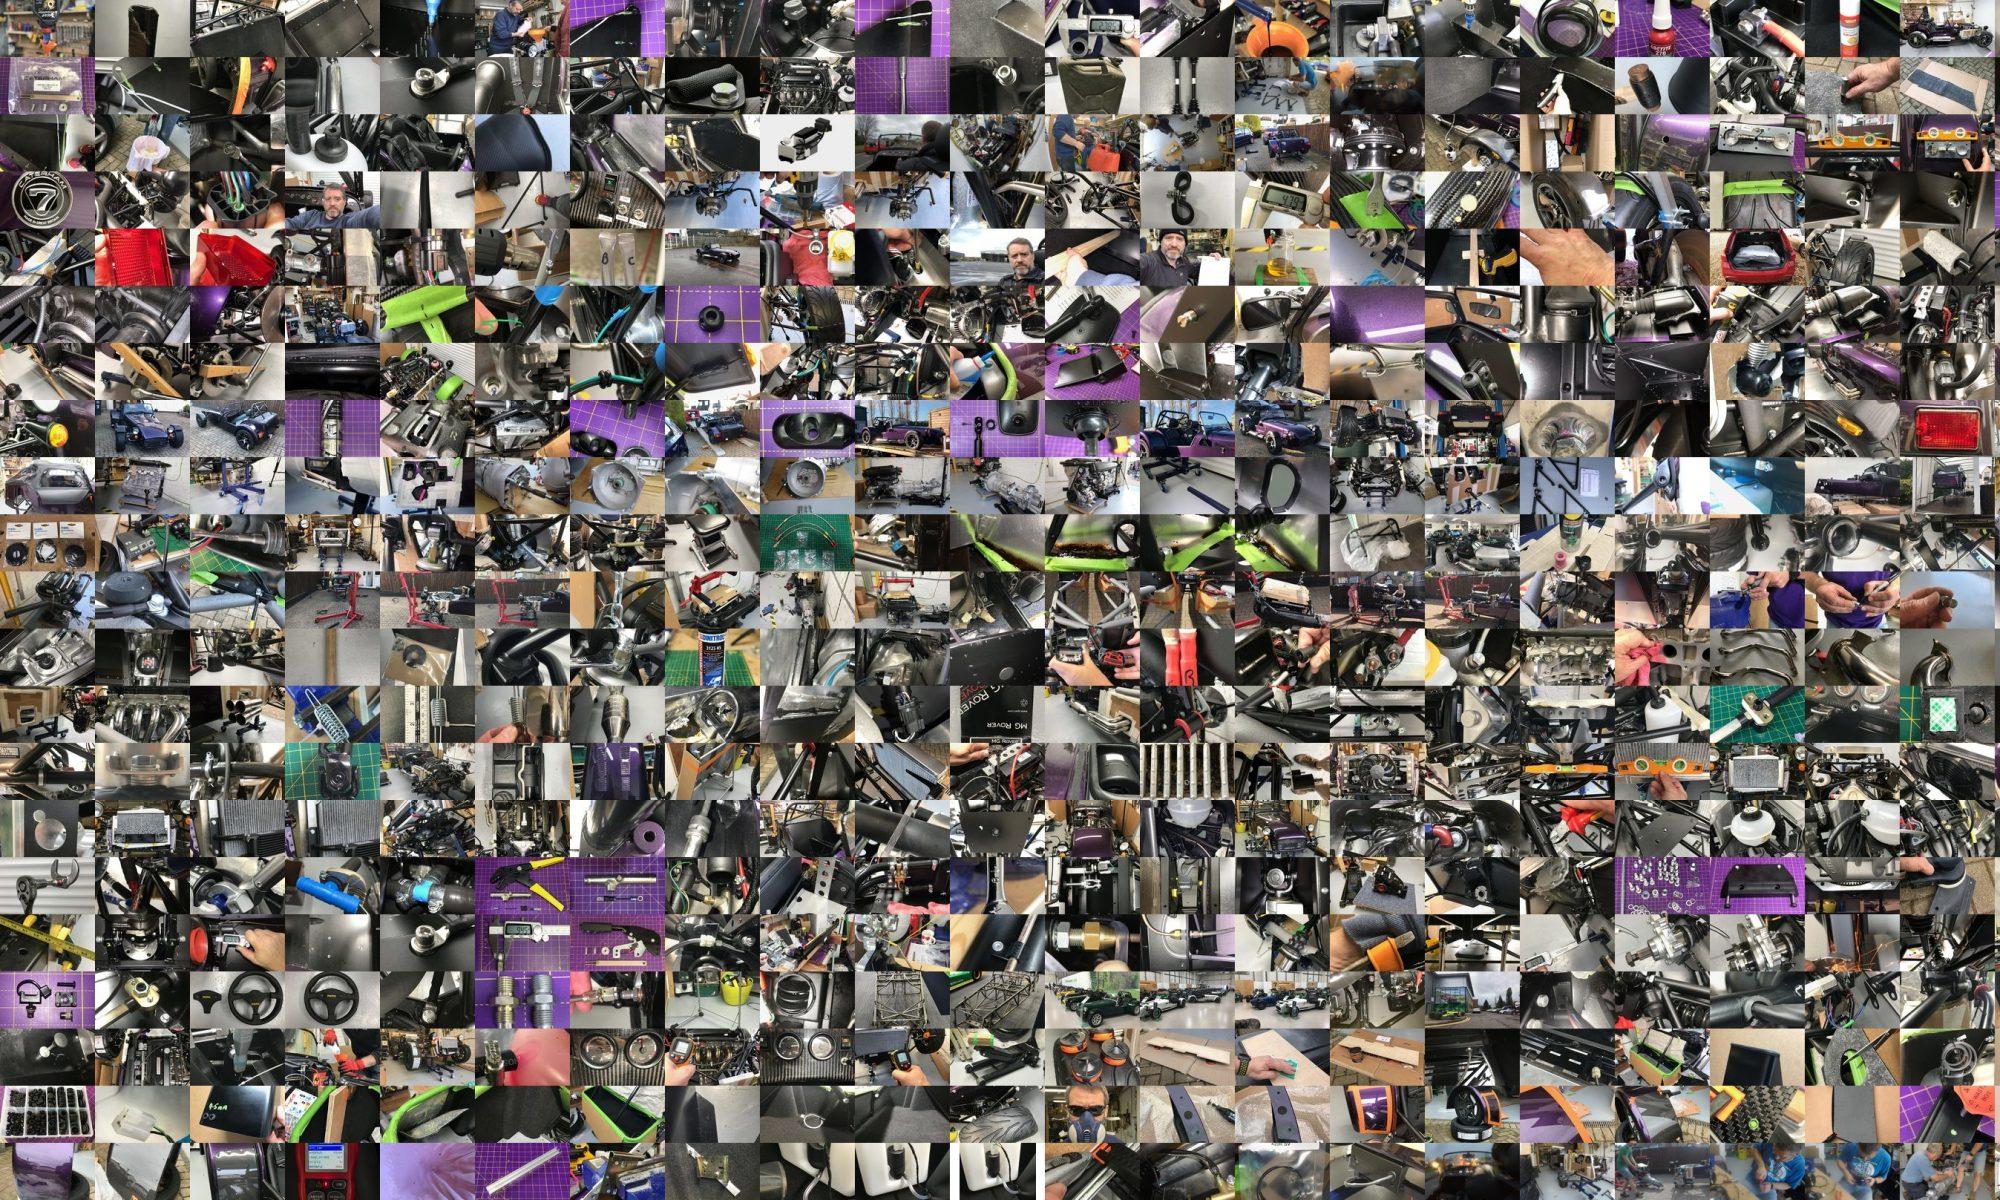 PurpleMeanie